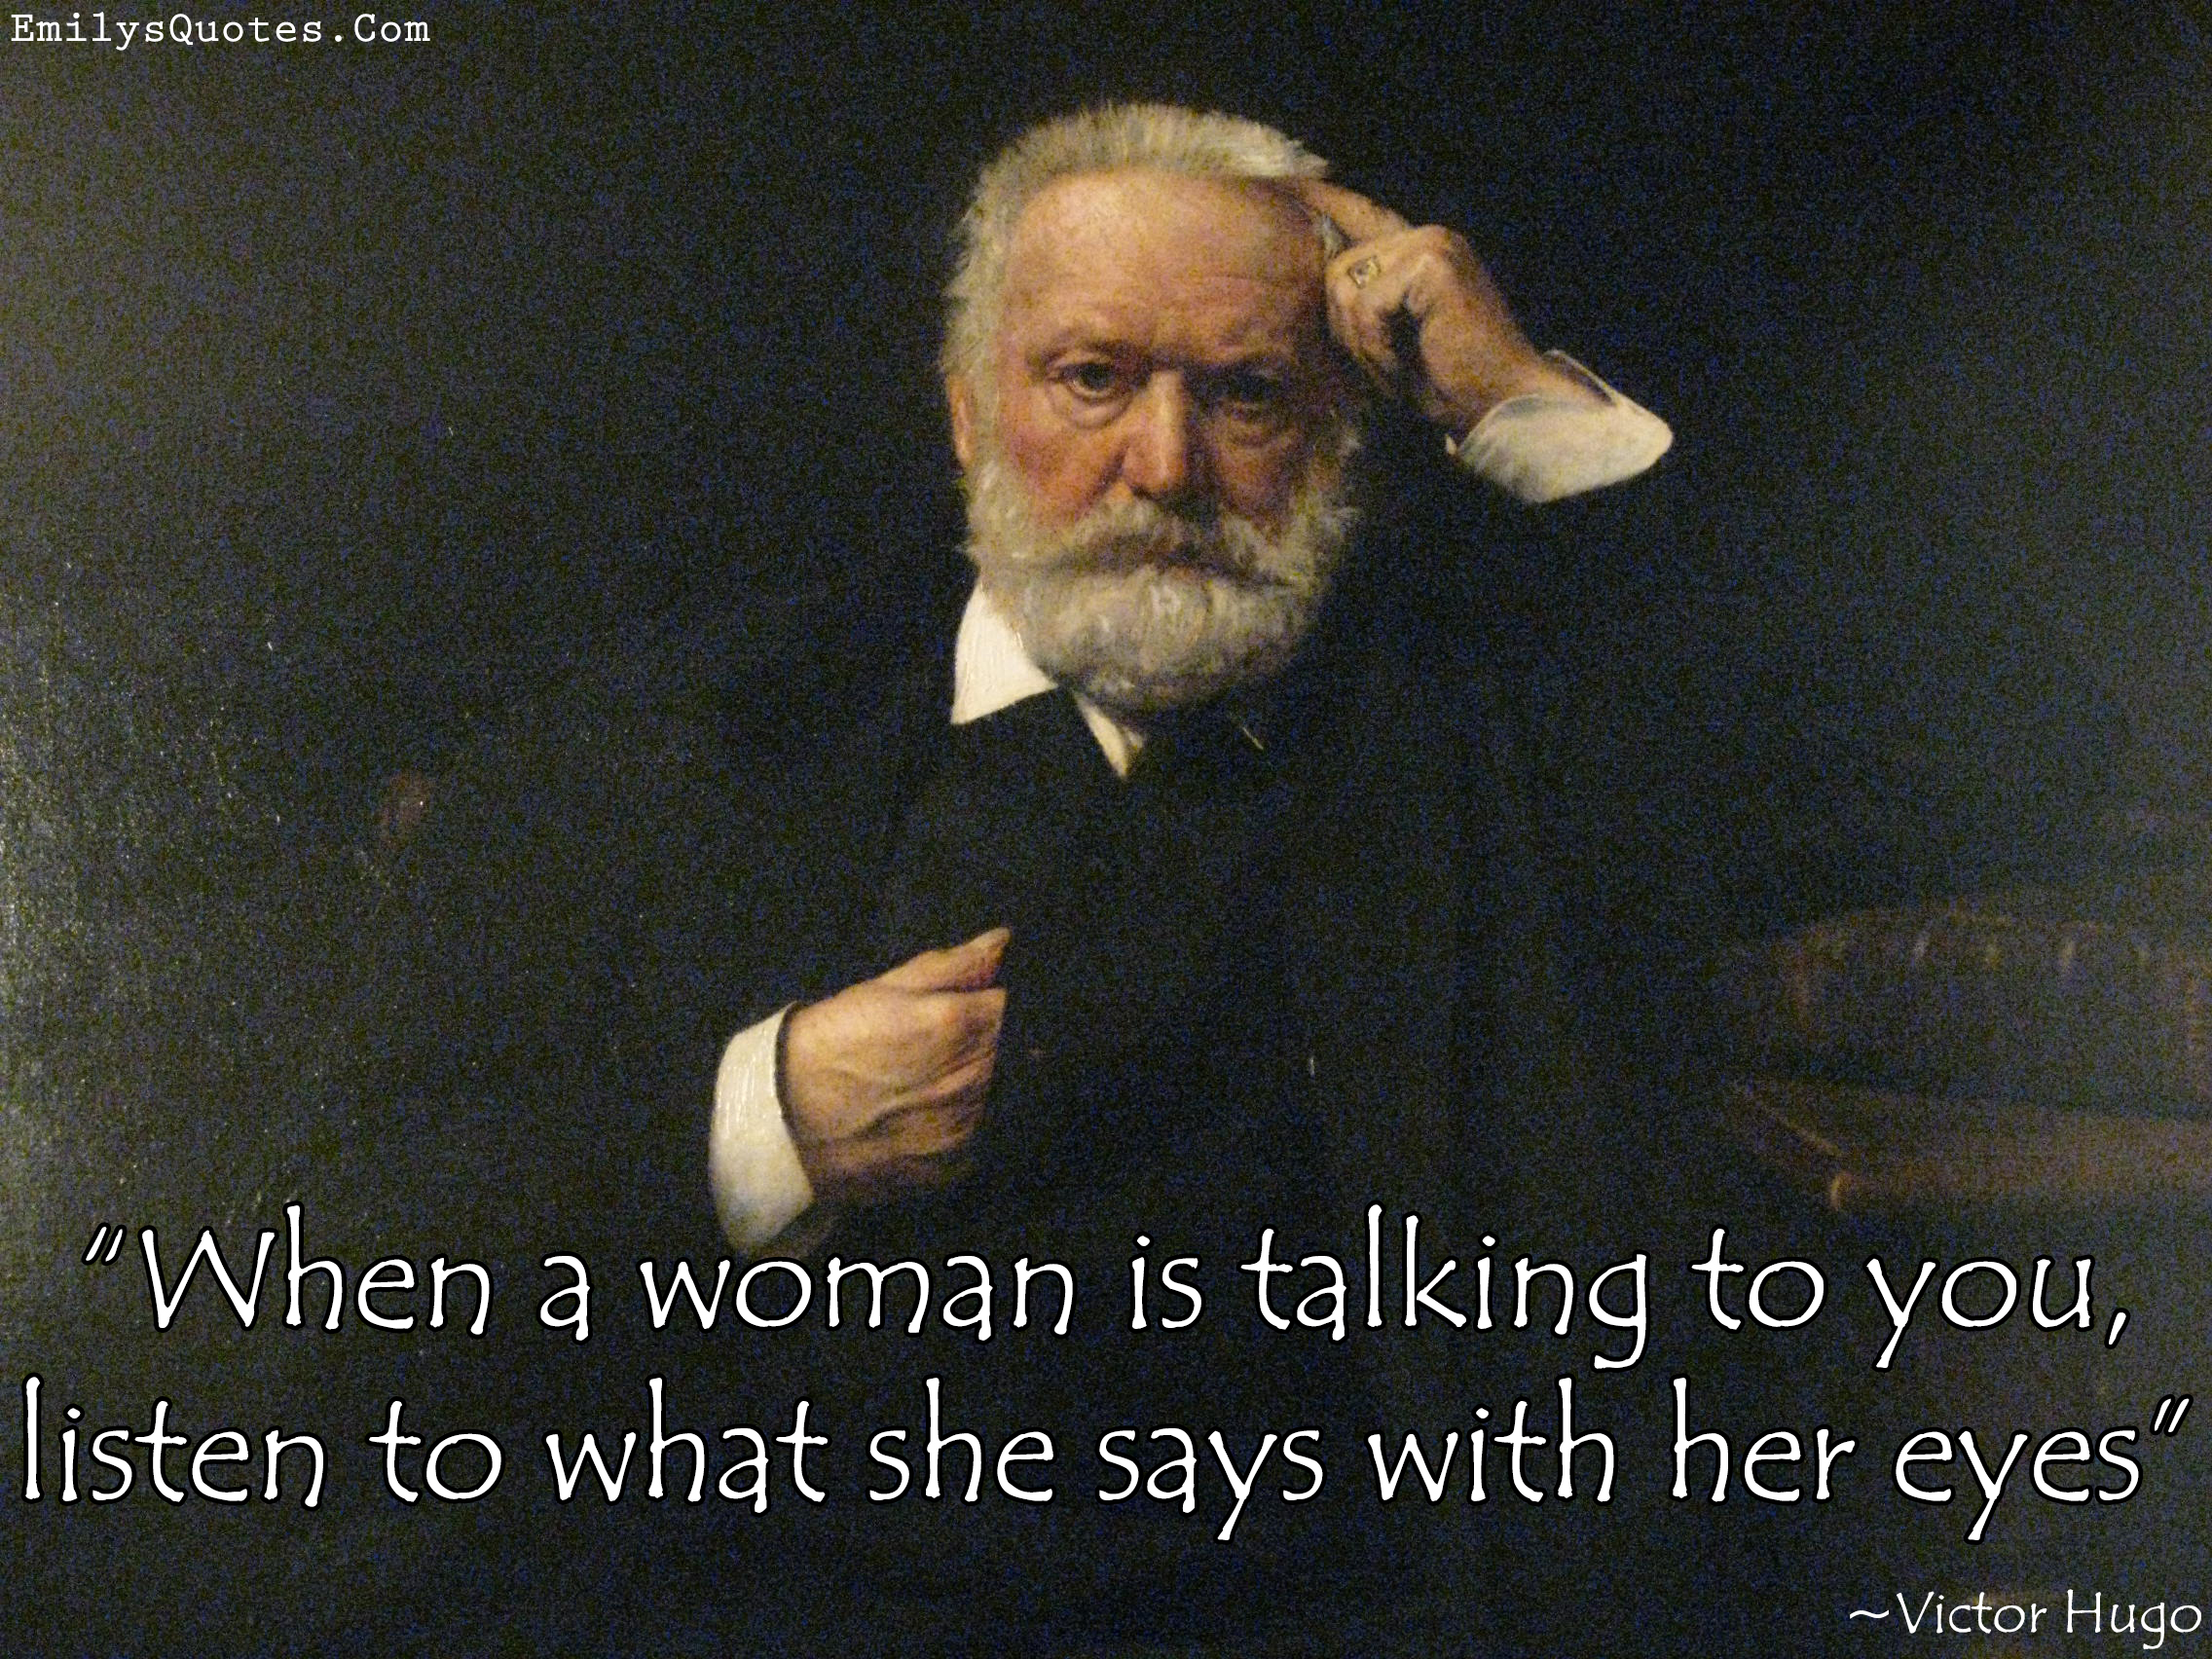 EmilysQuotes.Com - woman, listen, eyes, understanding, Victor Hugo